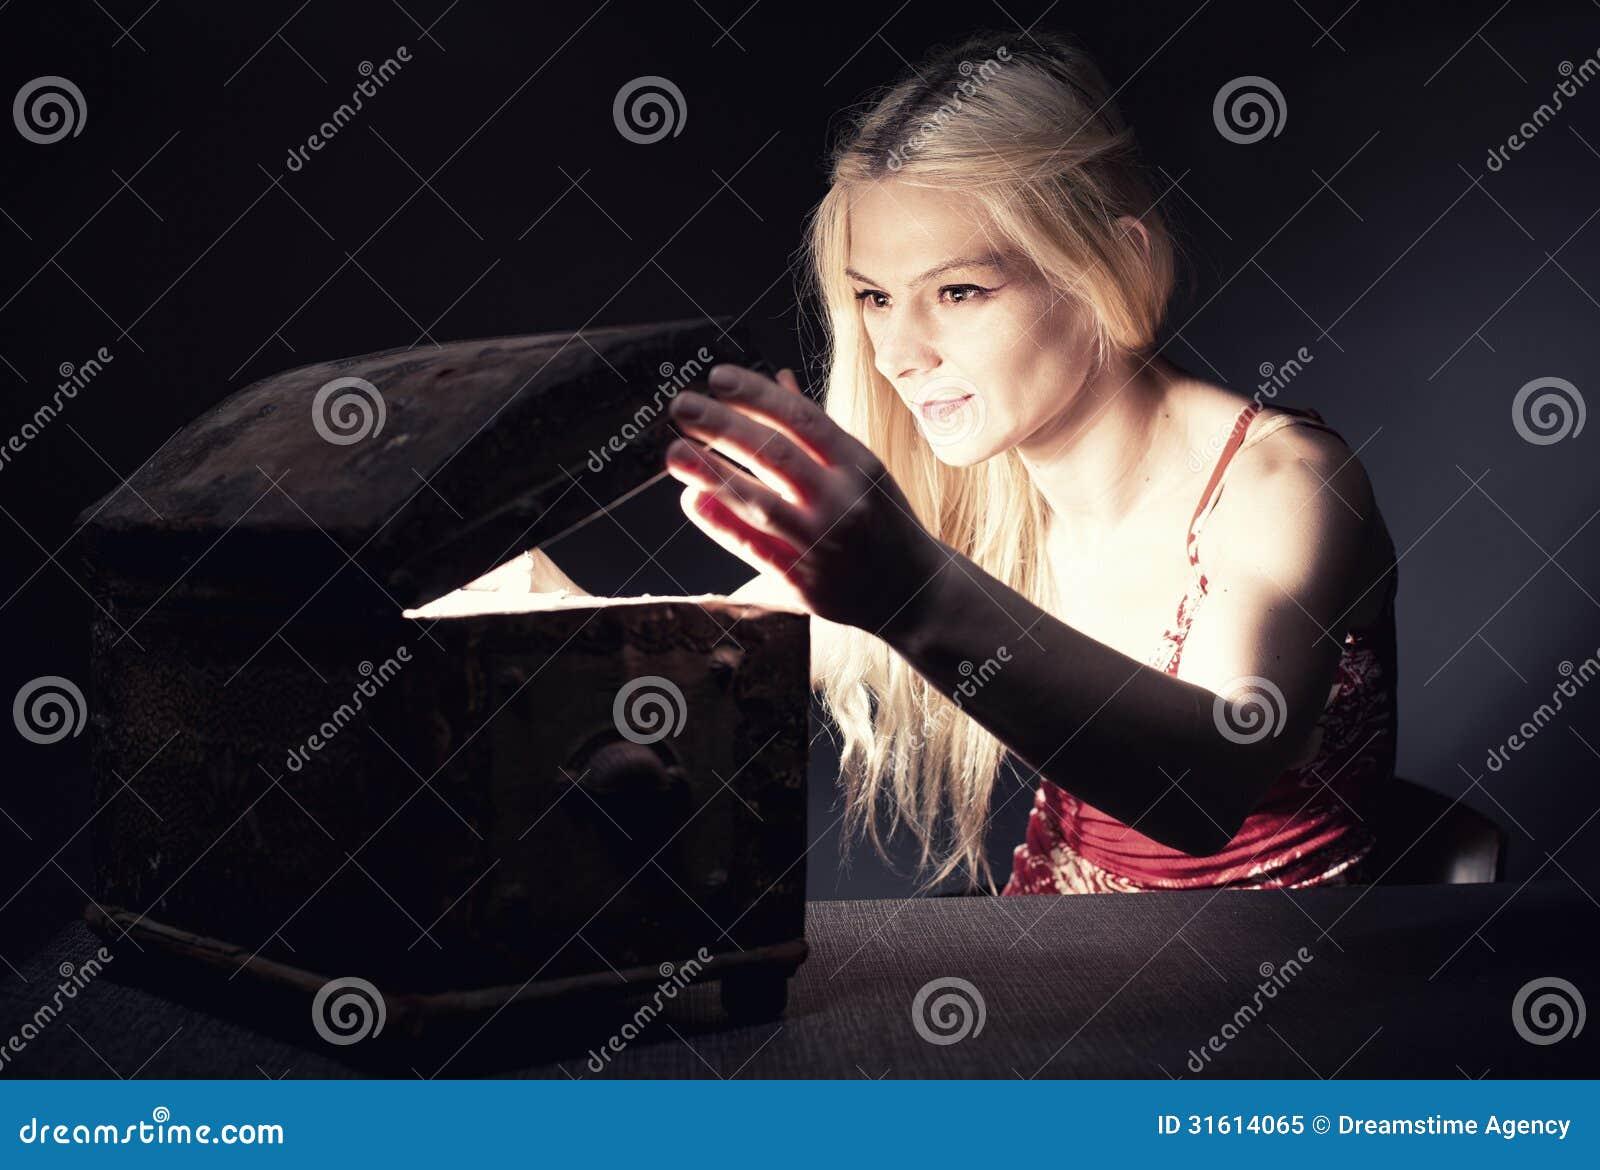 Download Treasure chest stock image. Image of portrait, concept - 31614065